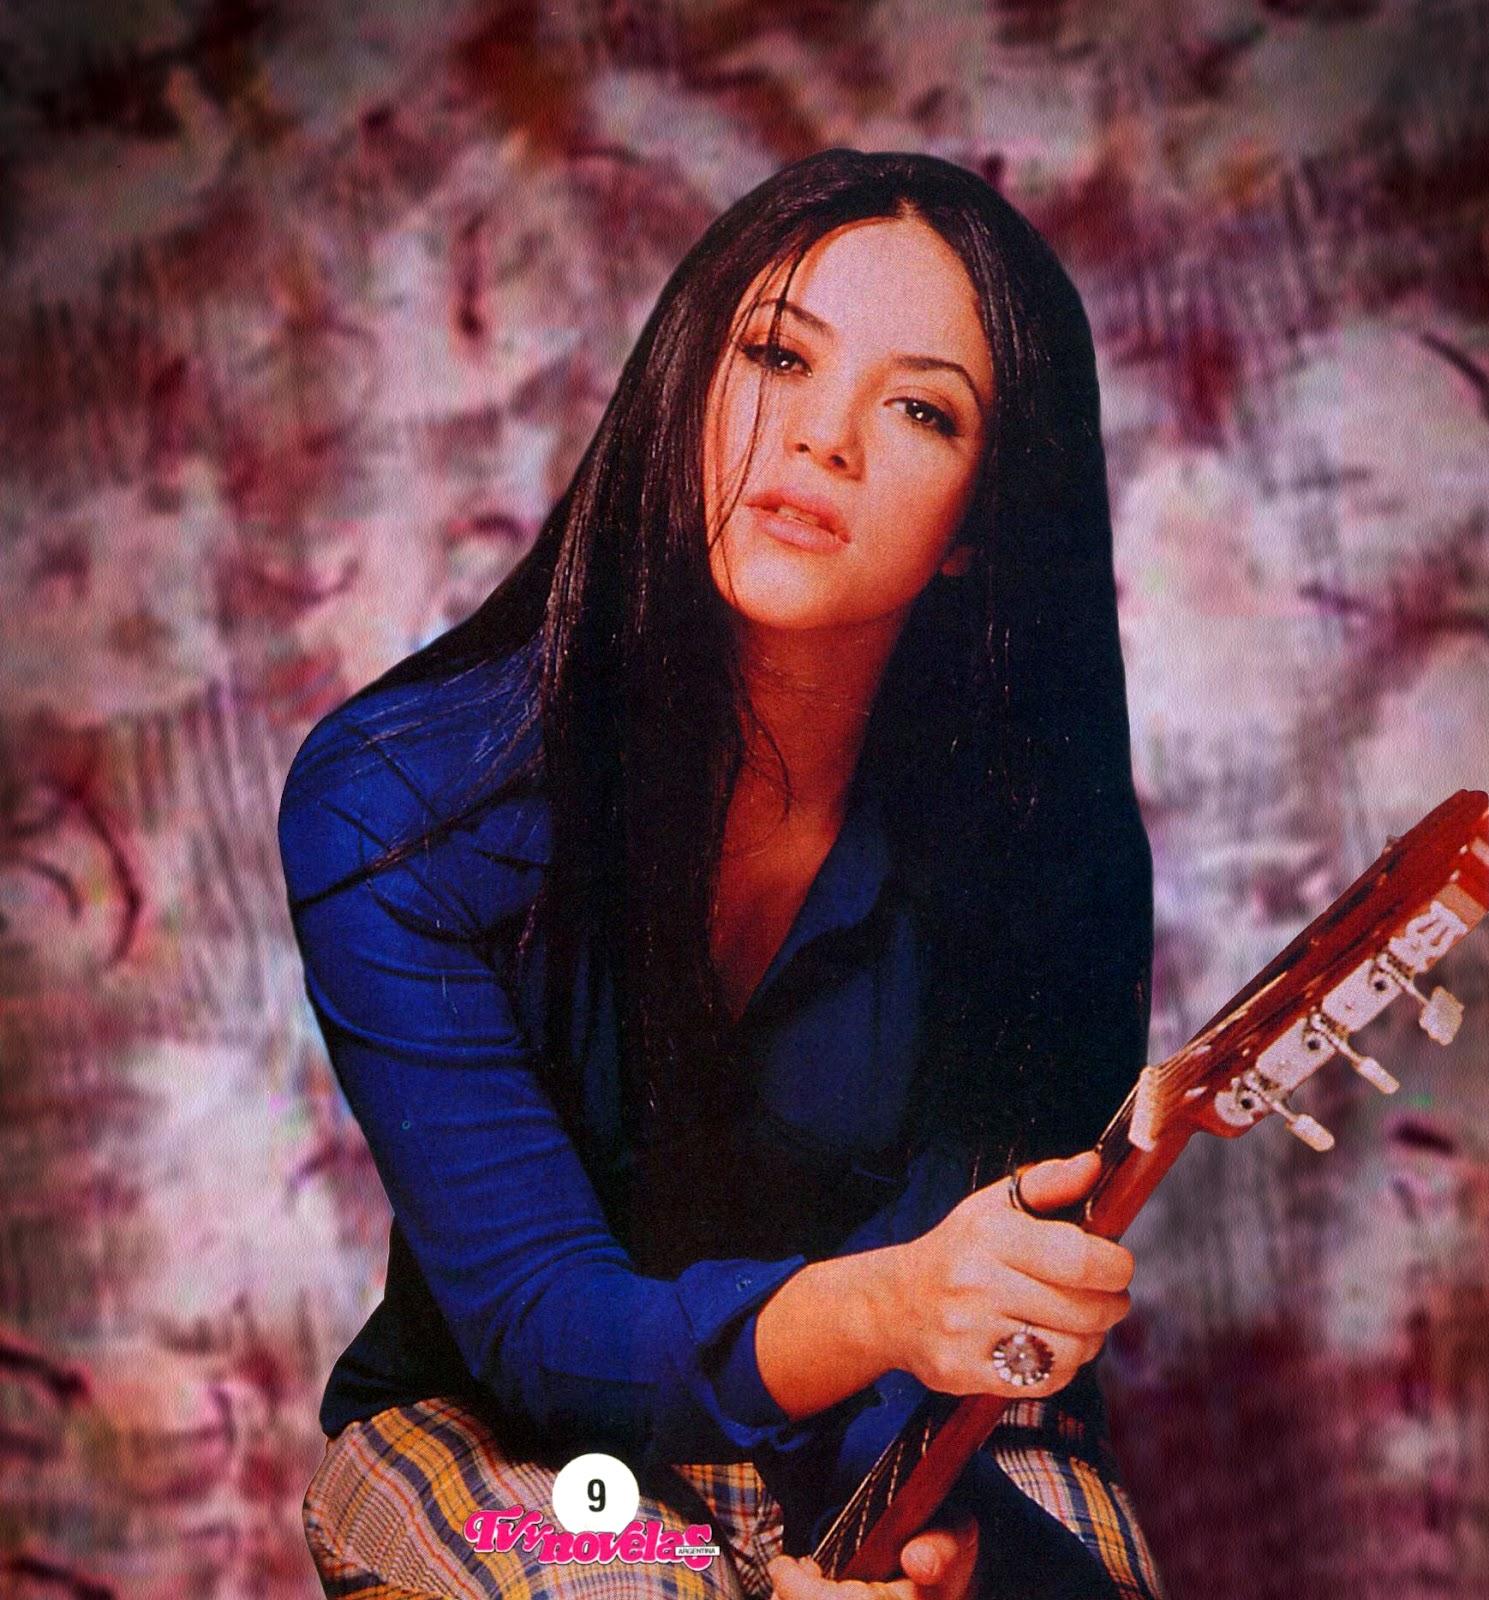 http://3.bp.blogspot.com/-G5NQC7r_v74/T02se13YsXI/AAAAAAAAFEY/z5bM_P5bF00/s1600/shakira-1996-b-c.jpg